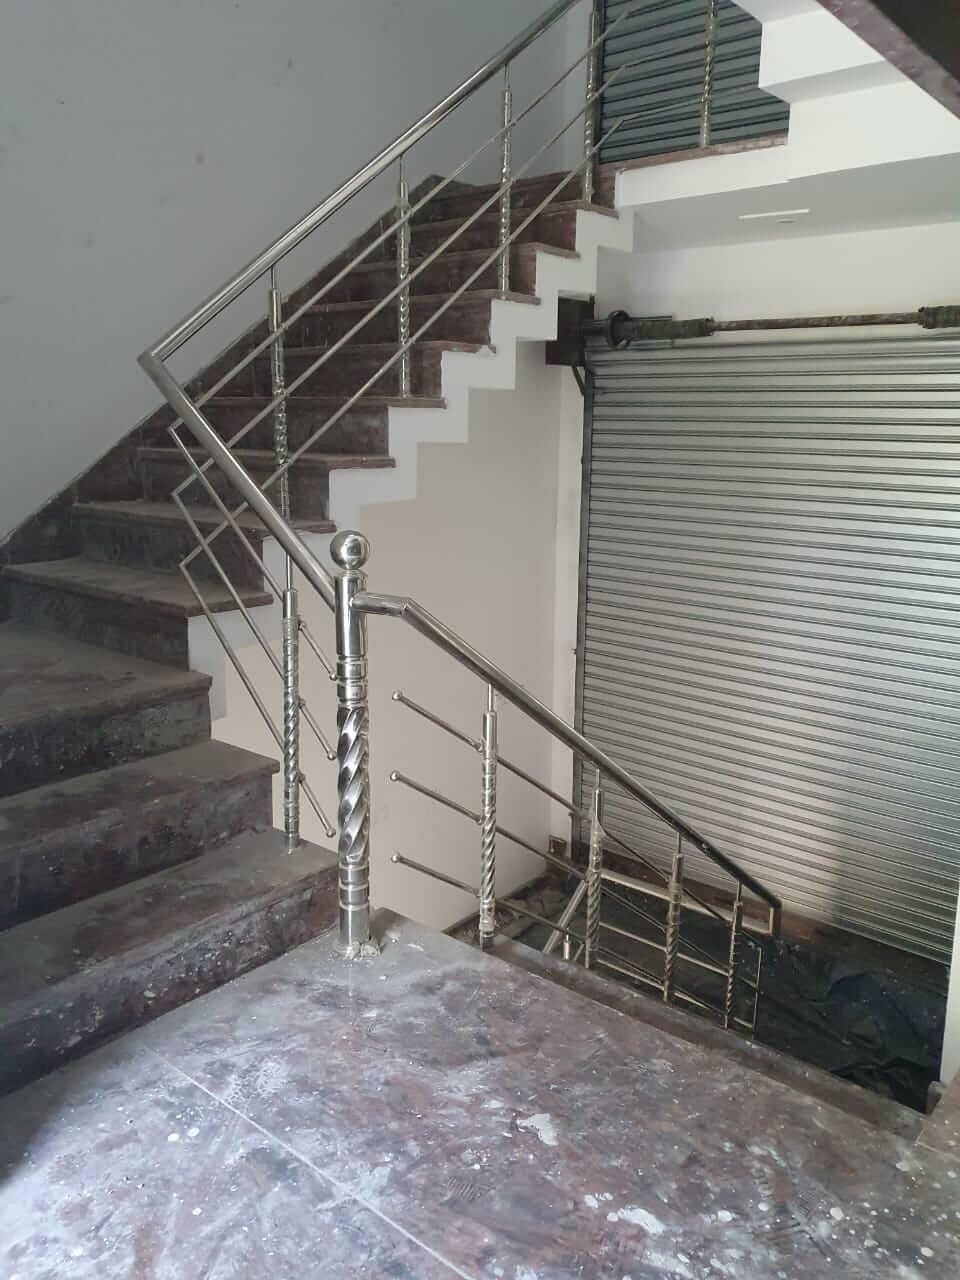 Showroom for Rent 1200 Sq. Feet at Muzaffarnagar